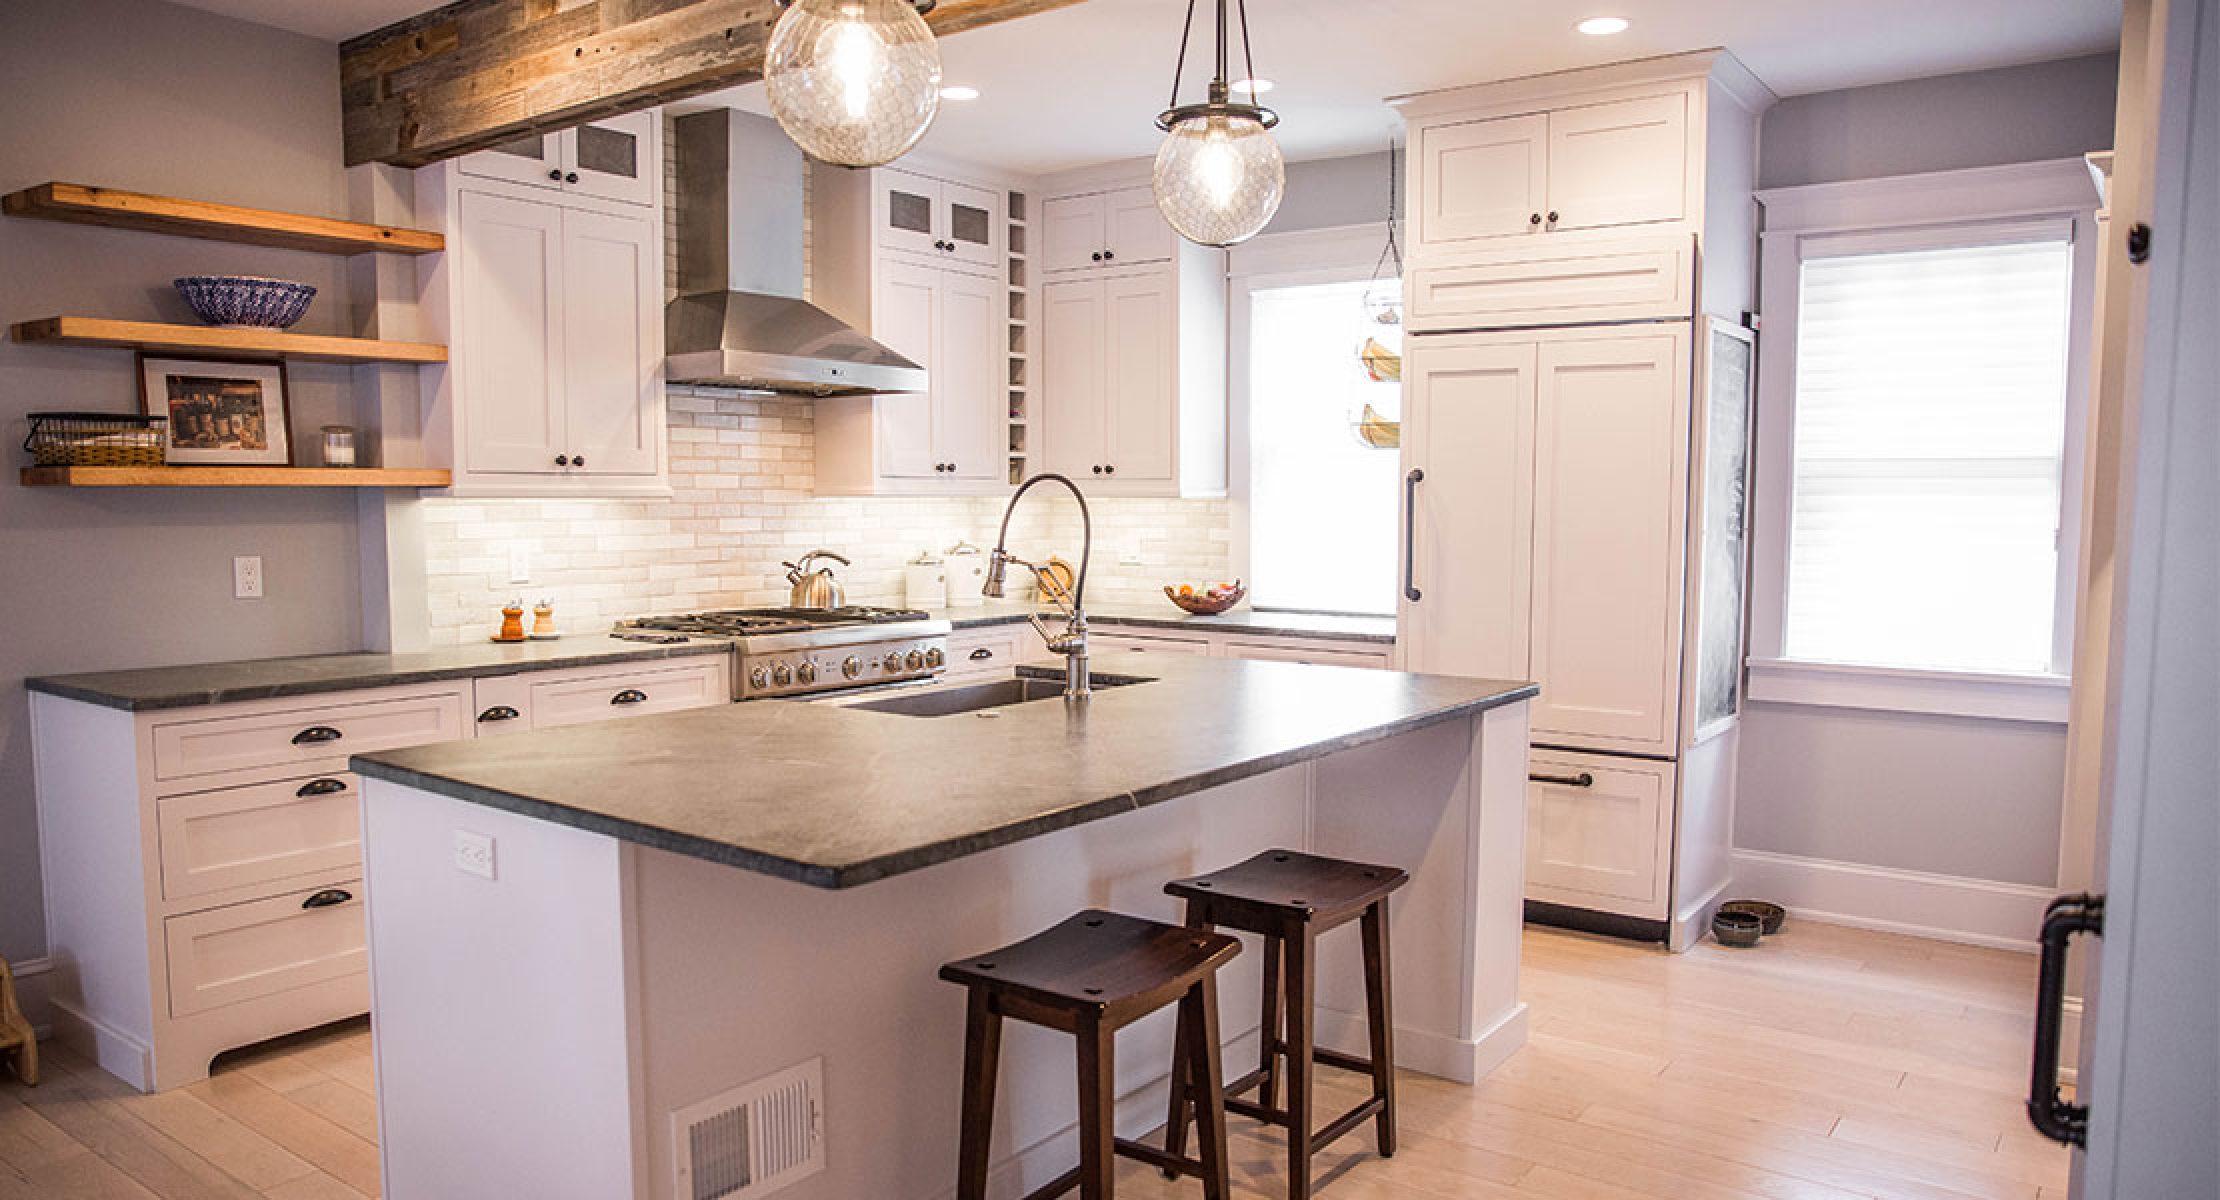 Kitchen Remodel With Bella Casa Lehigh Valley Marketplacelehigh Valley Marketplace